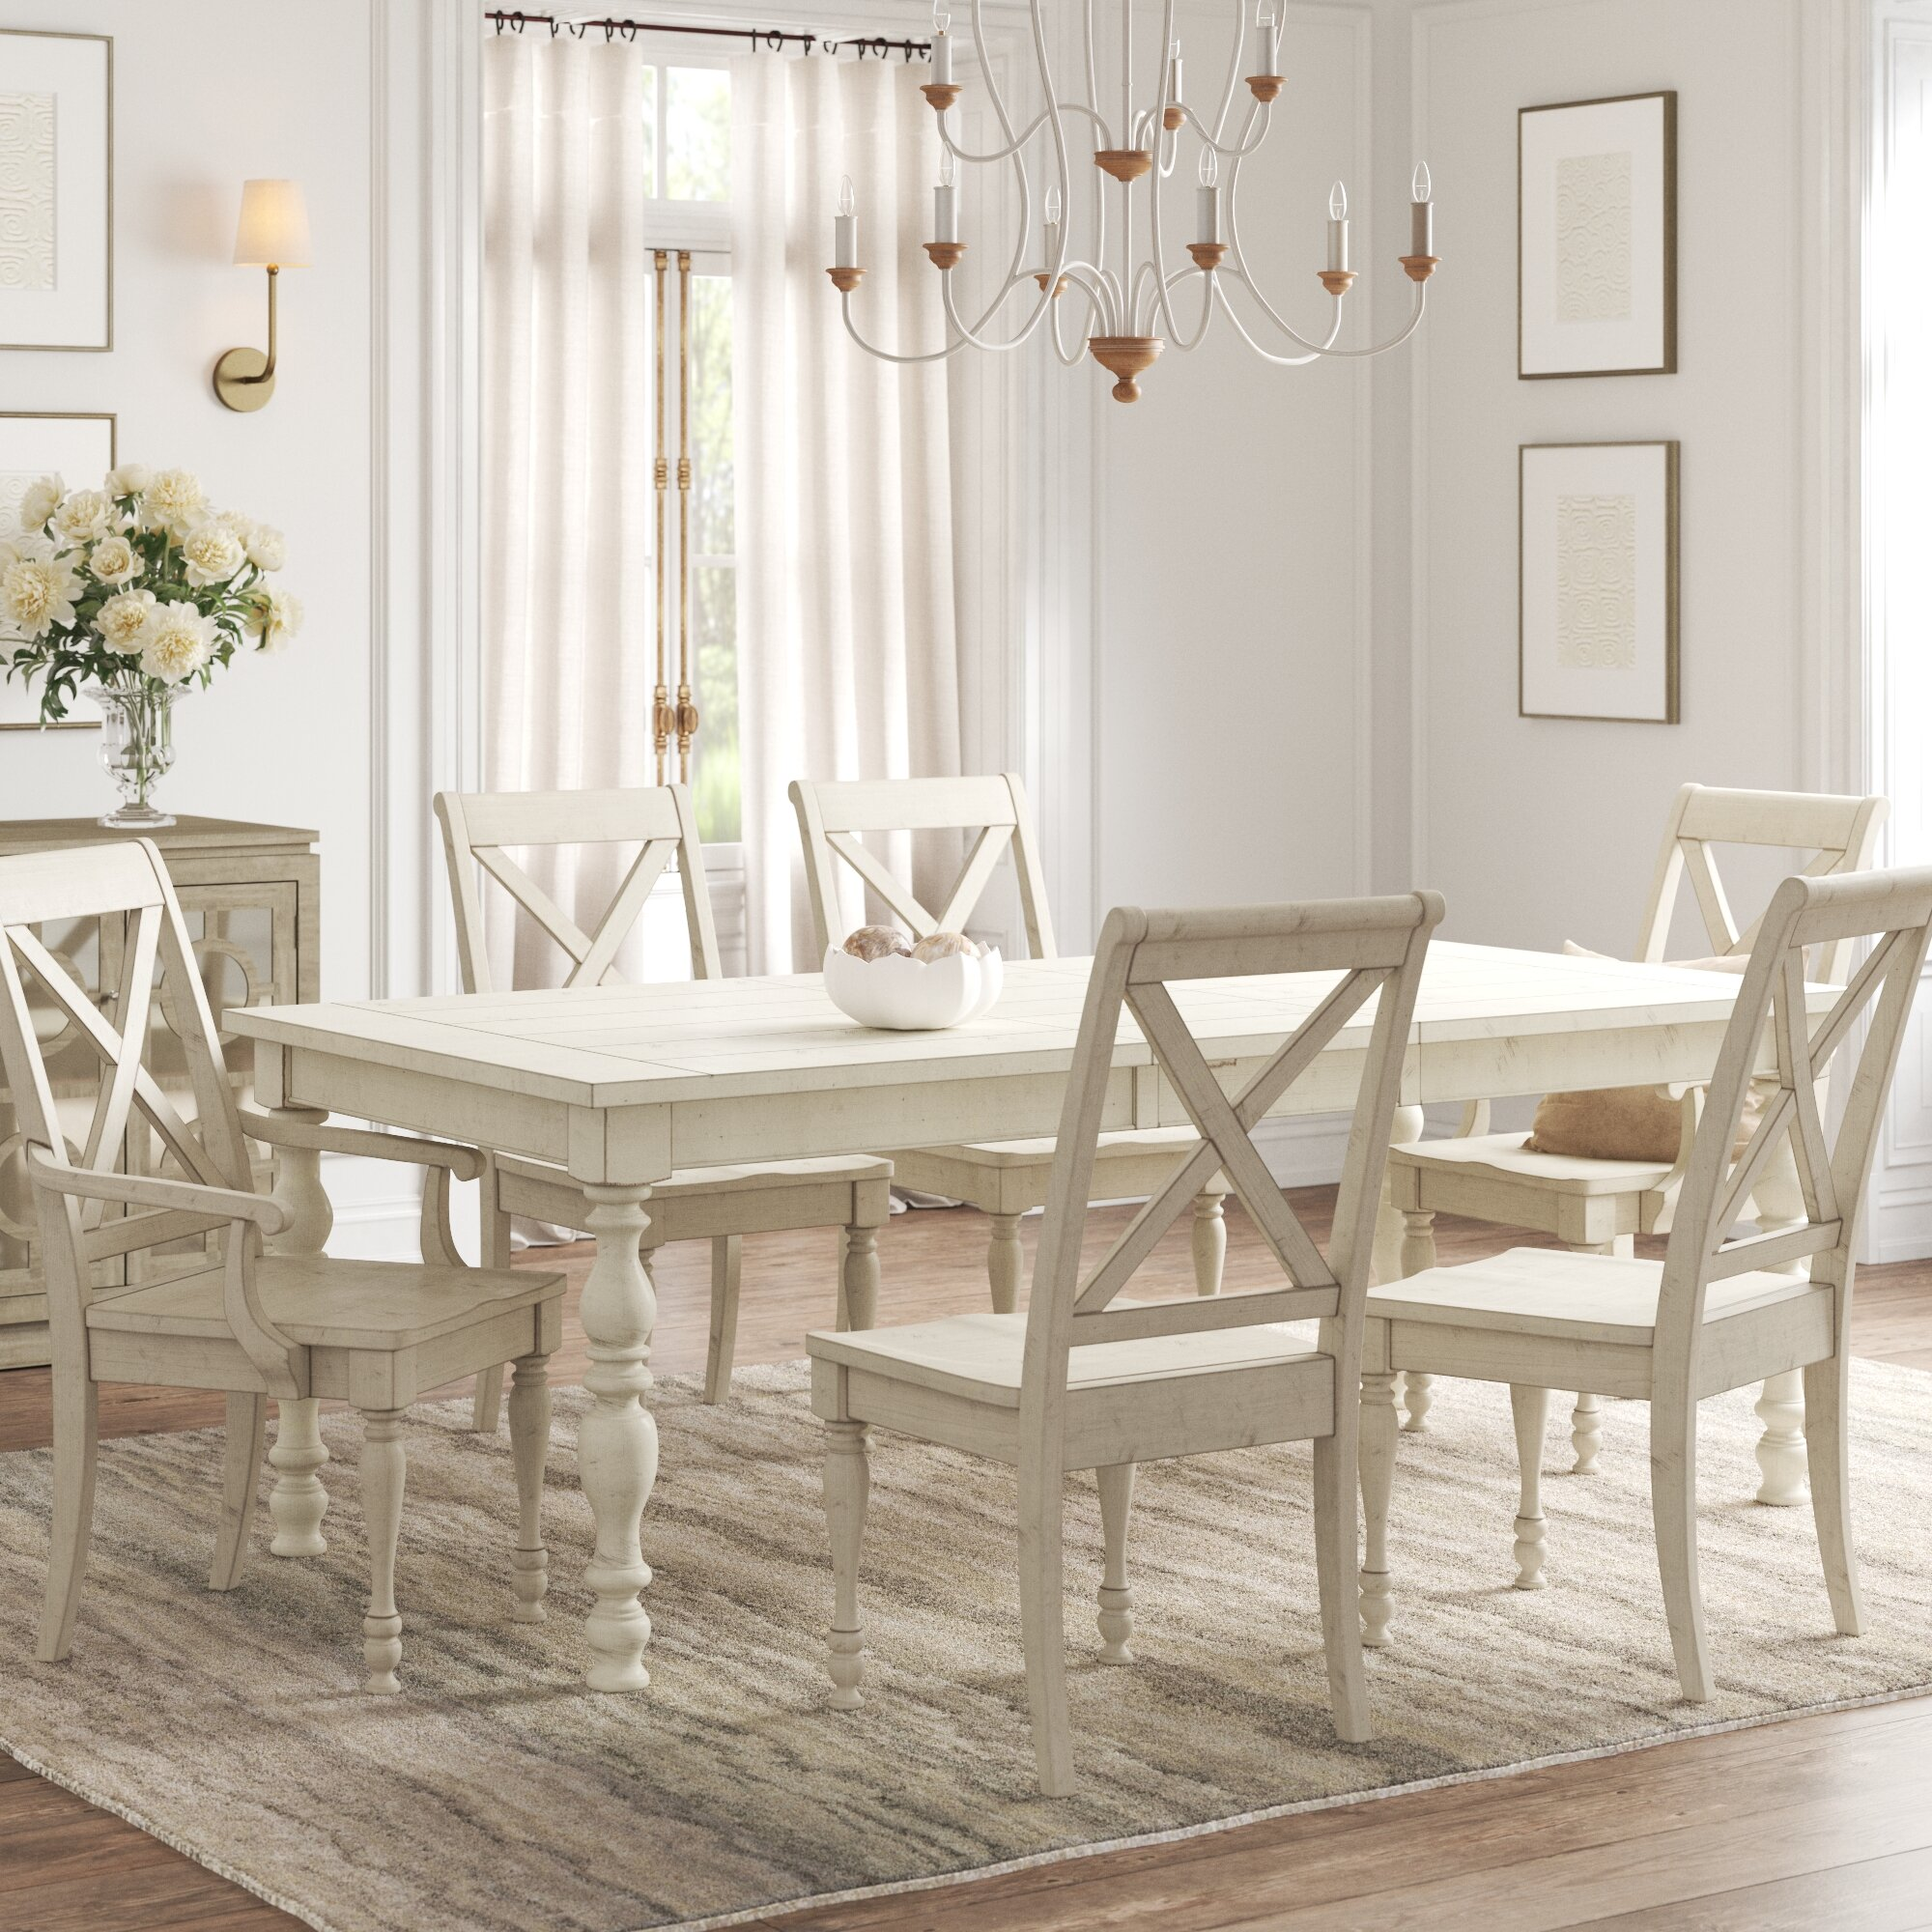 Kelly Clarkson Home Eminence 7 Piece Extendable Dining Set Reviews Wayfair